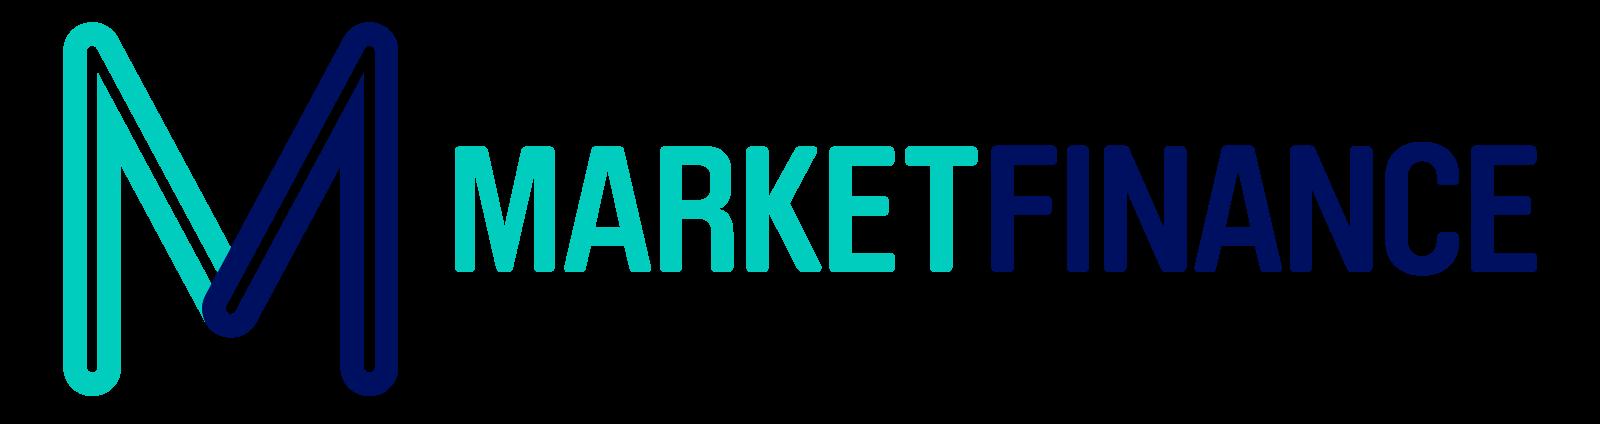 MarketFinance Logo